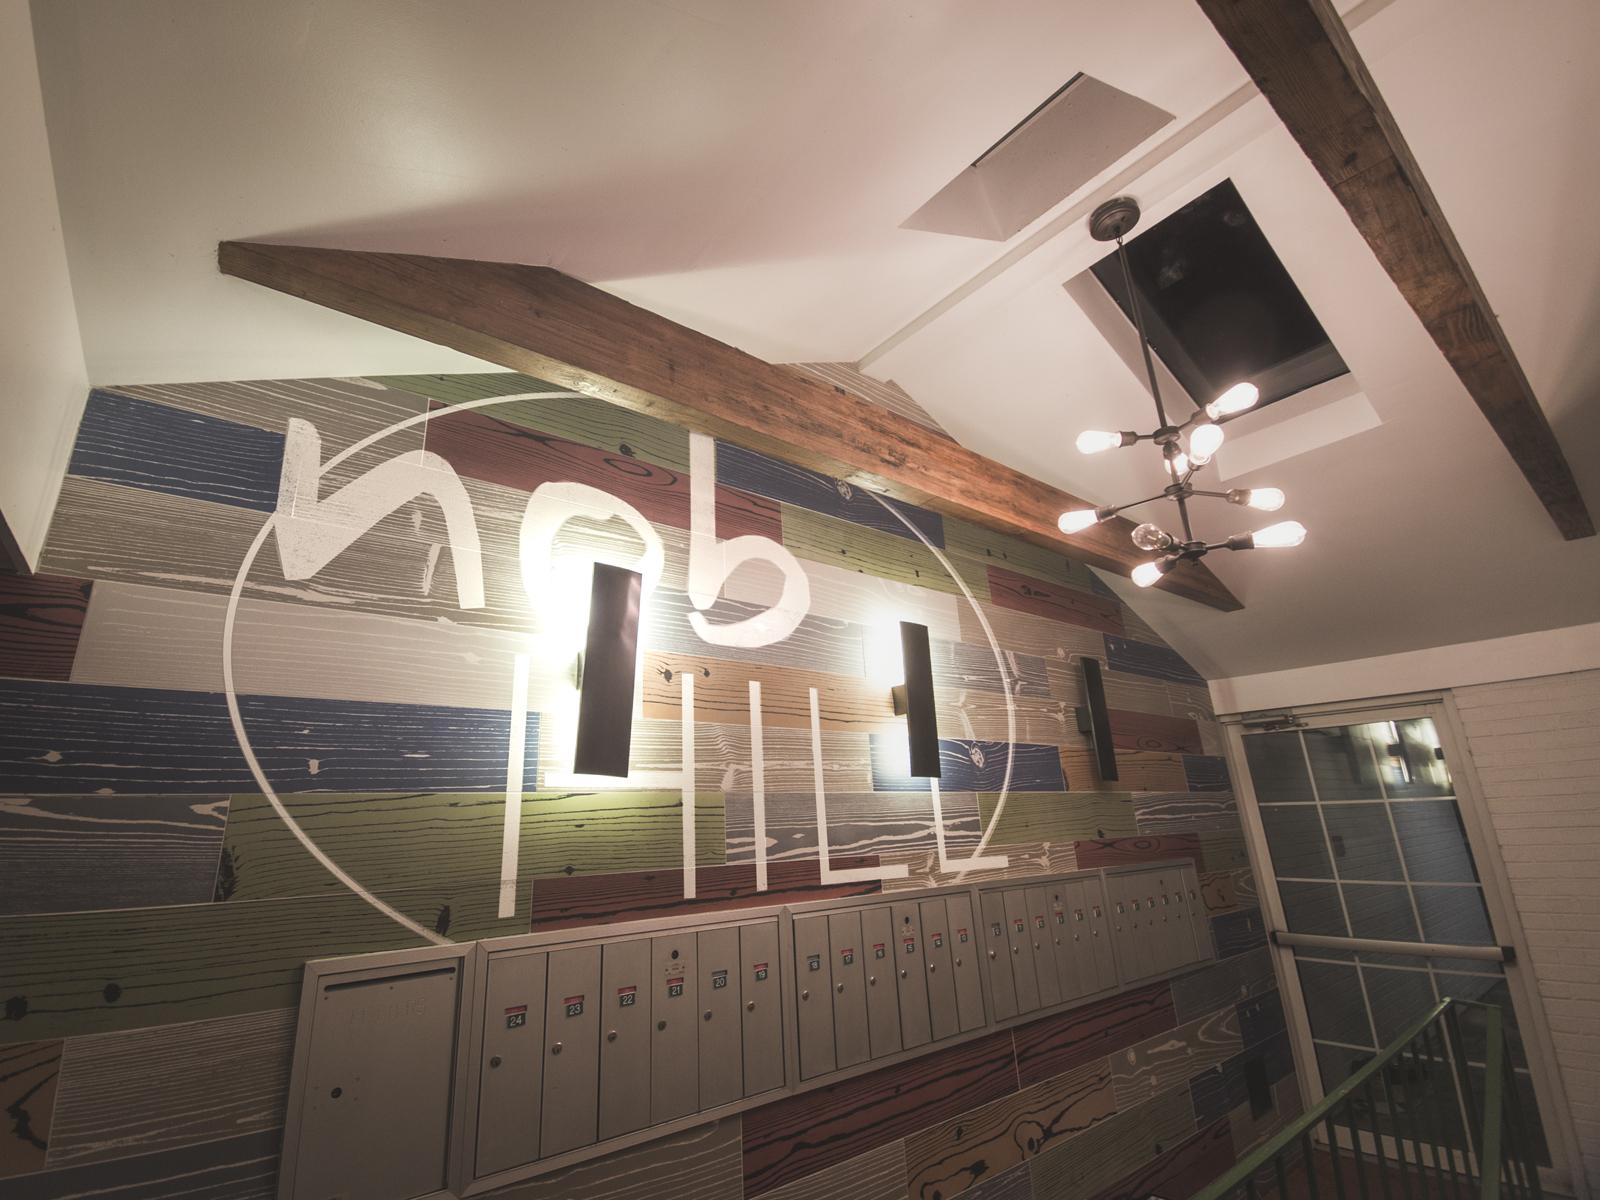 Nob Hill Apartments Standard Bedroom Apartment For Rent Charlottesville Msc Uva